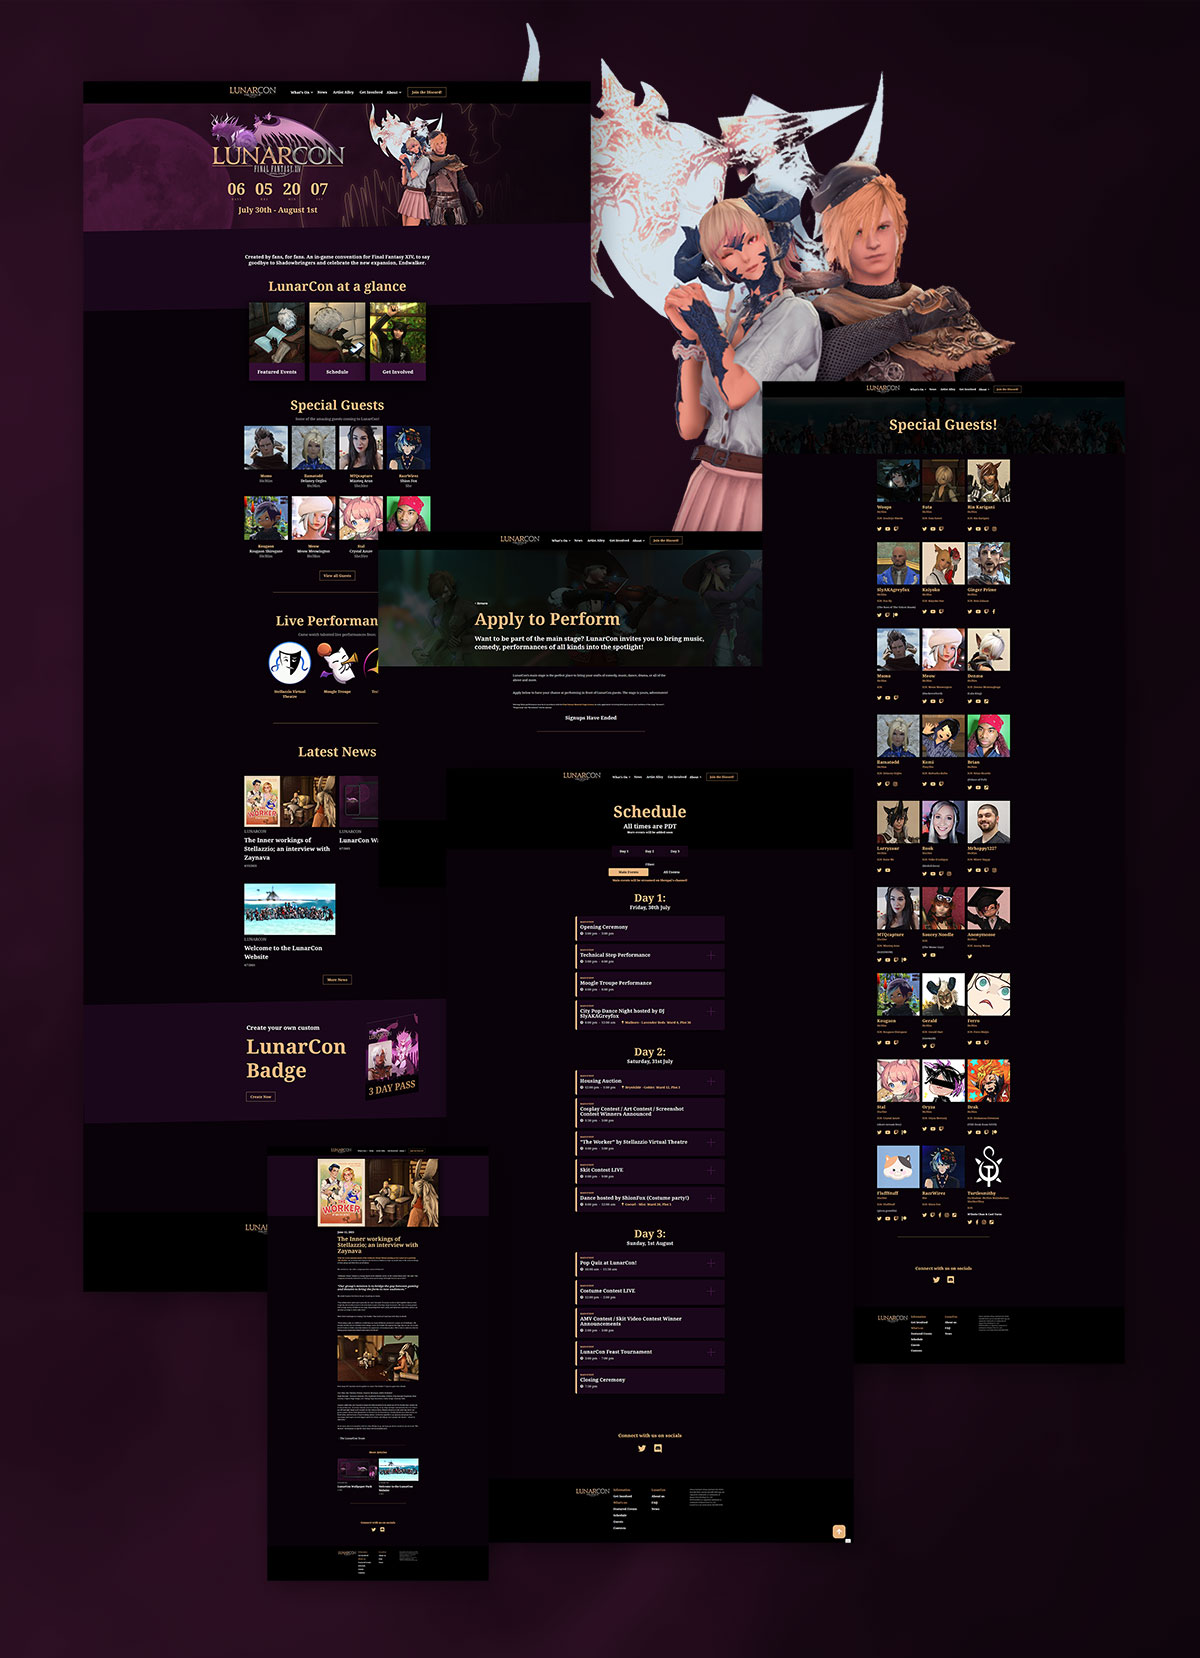 LunarCon Website Design in full